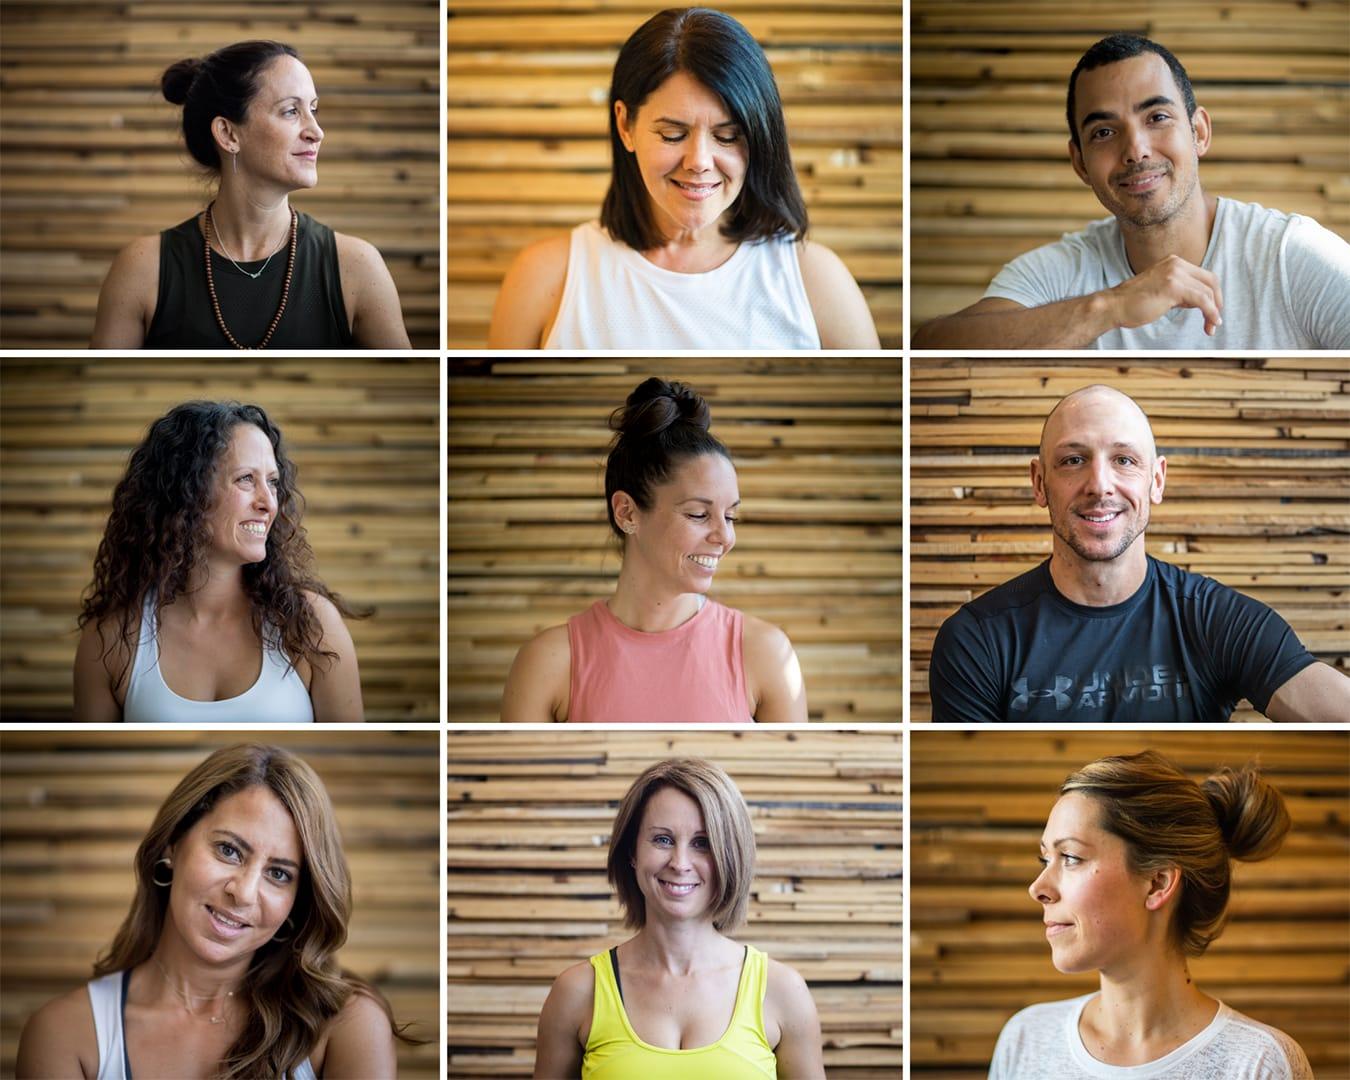 Équipe - La Pause Yoga Chaud